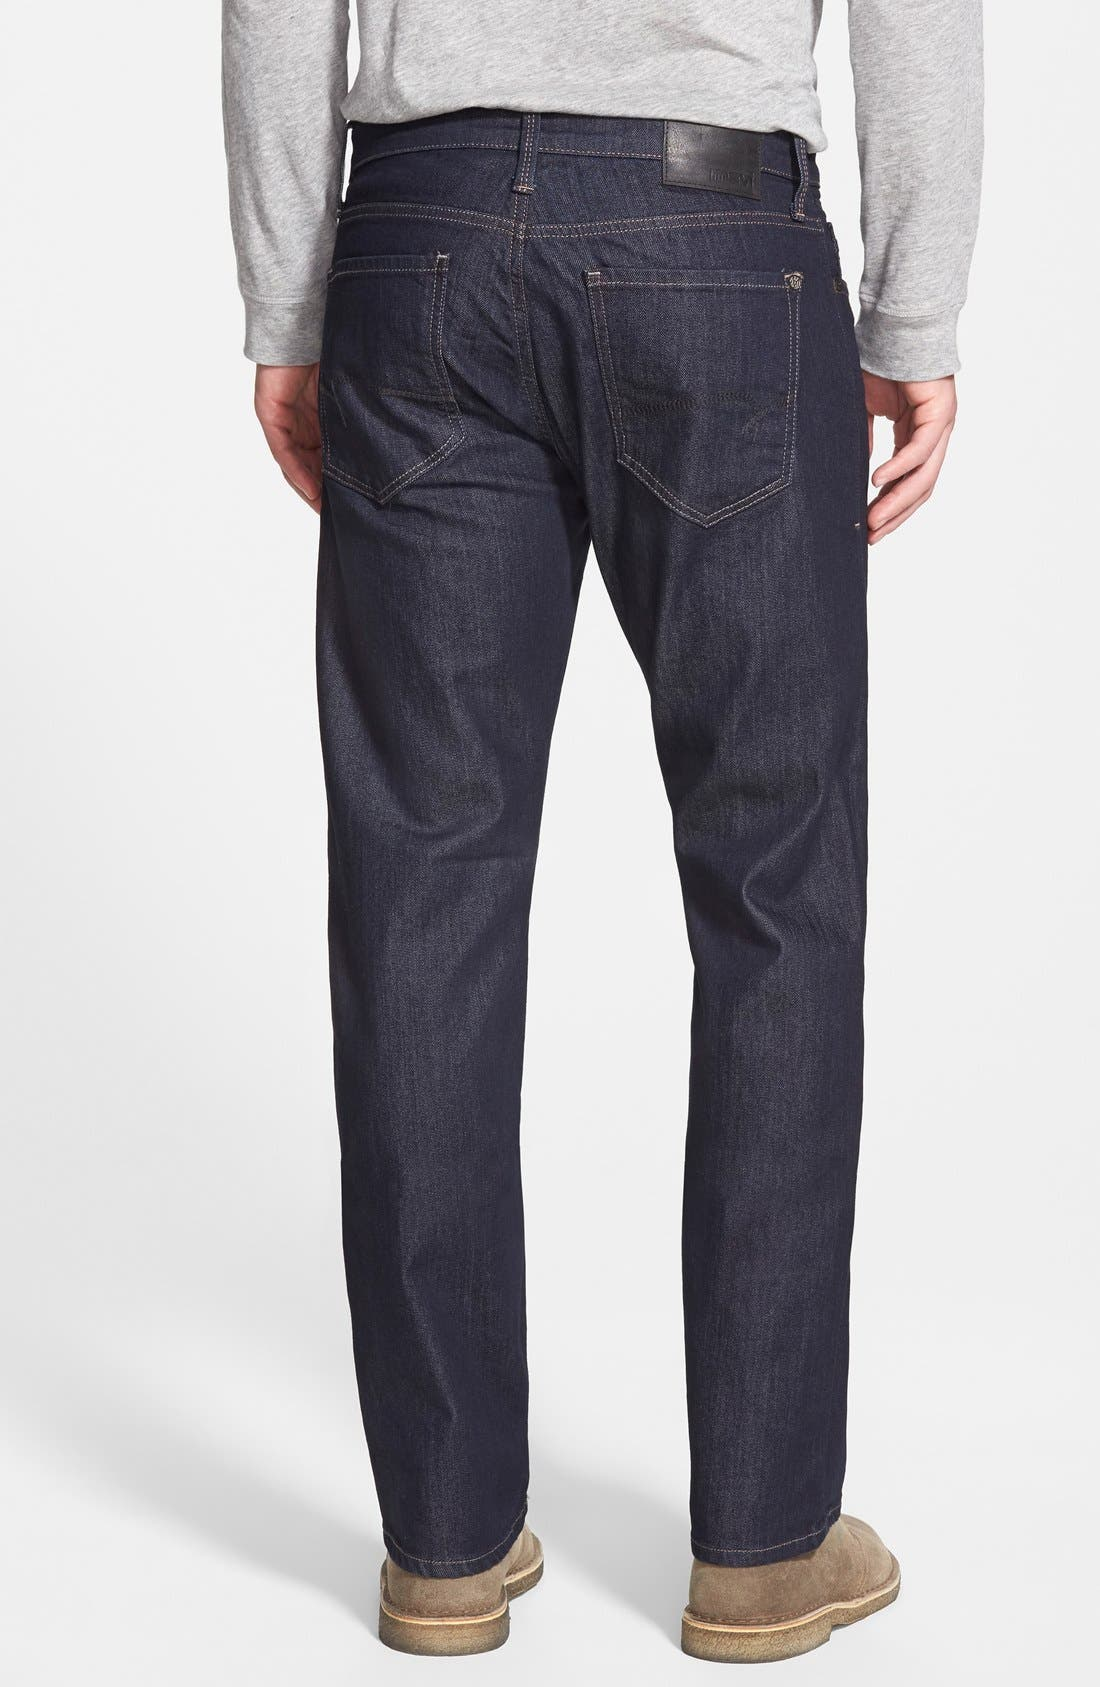 Zach Straight Leg Jeans,                             Alternate thumbnail 3, color,                             RINSE WILLIAMSBURG